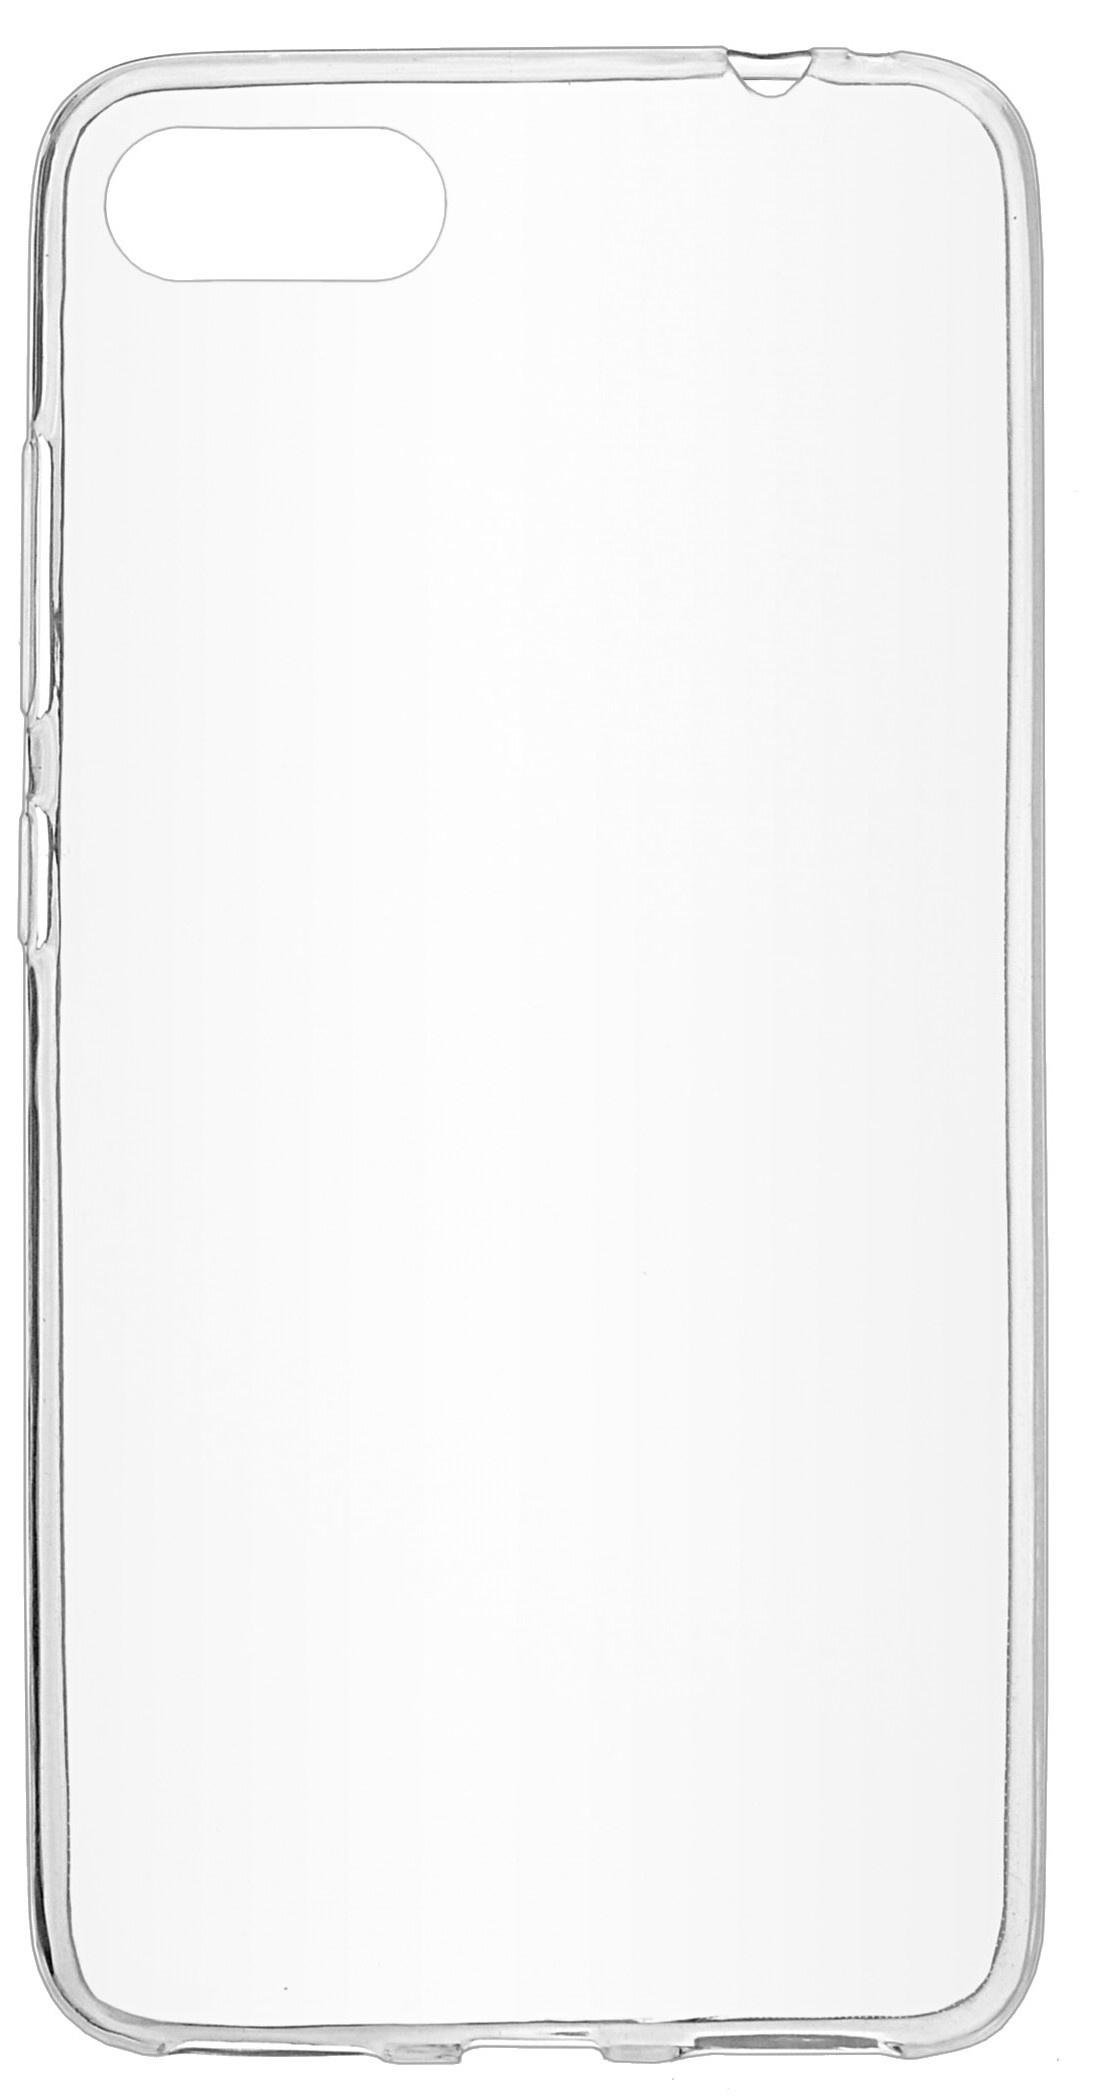 Чехол для сотового телефона skinBOX Slim Silicone, 4660041409239, прозрачный цены онлайн